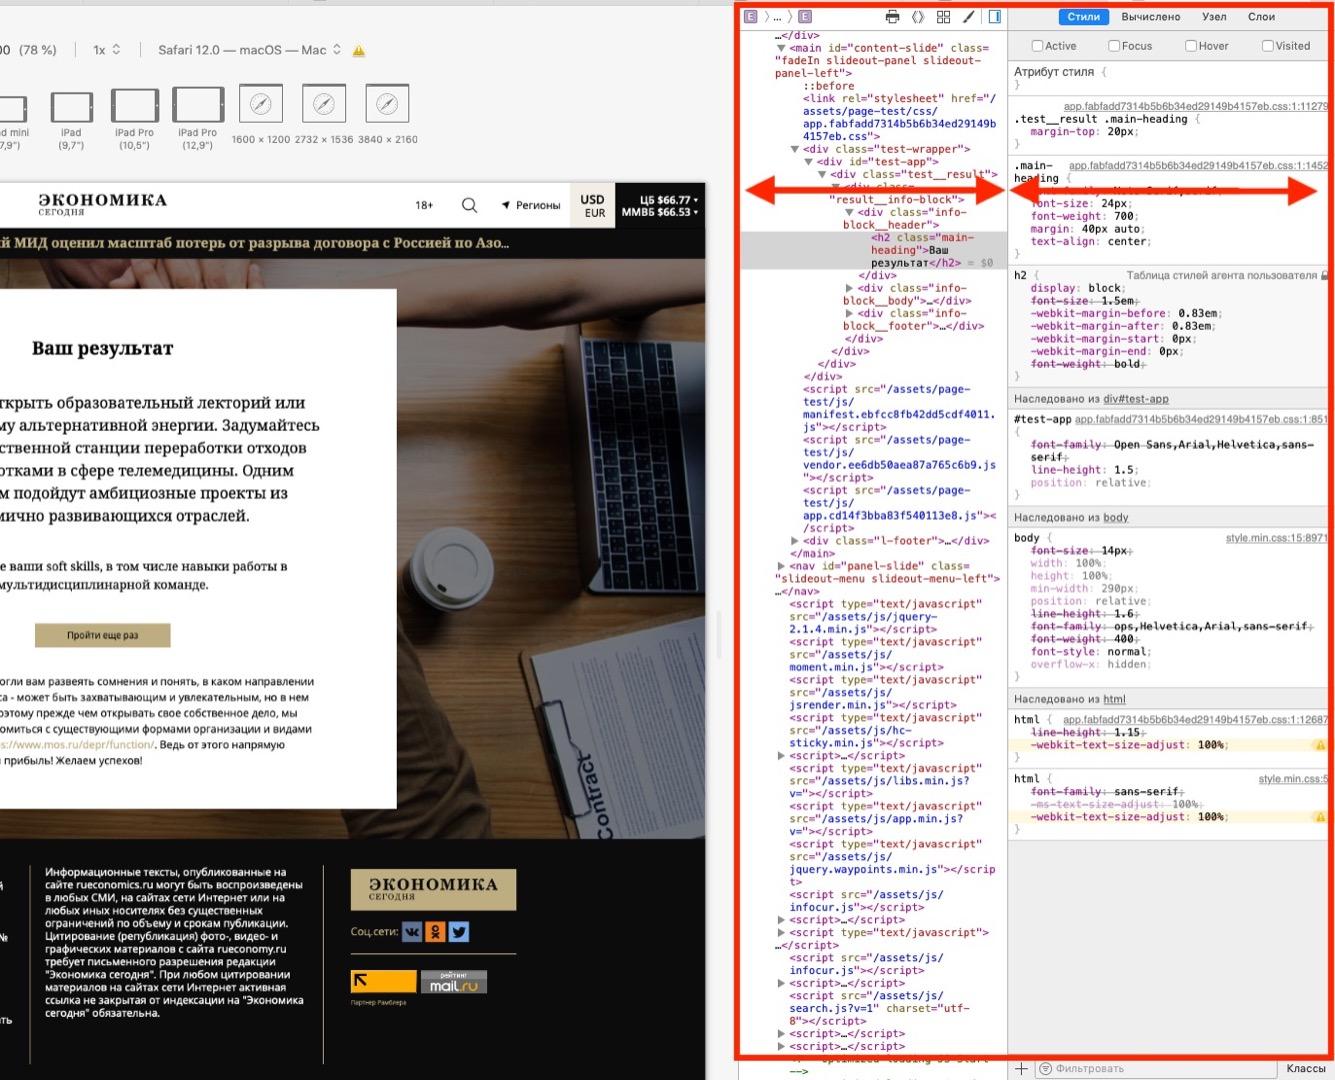 Safari Web Inspector - HTML/CSS tab - Apple Community